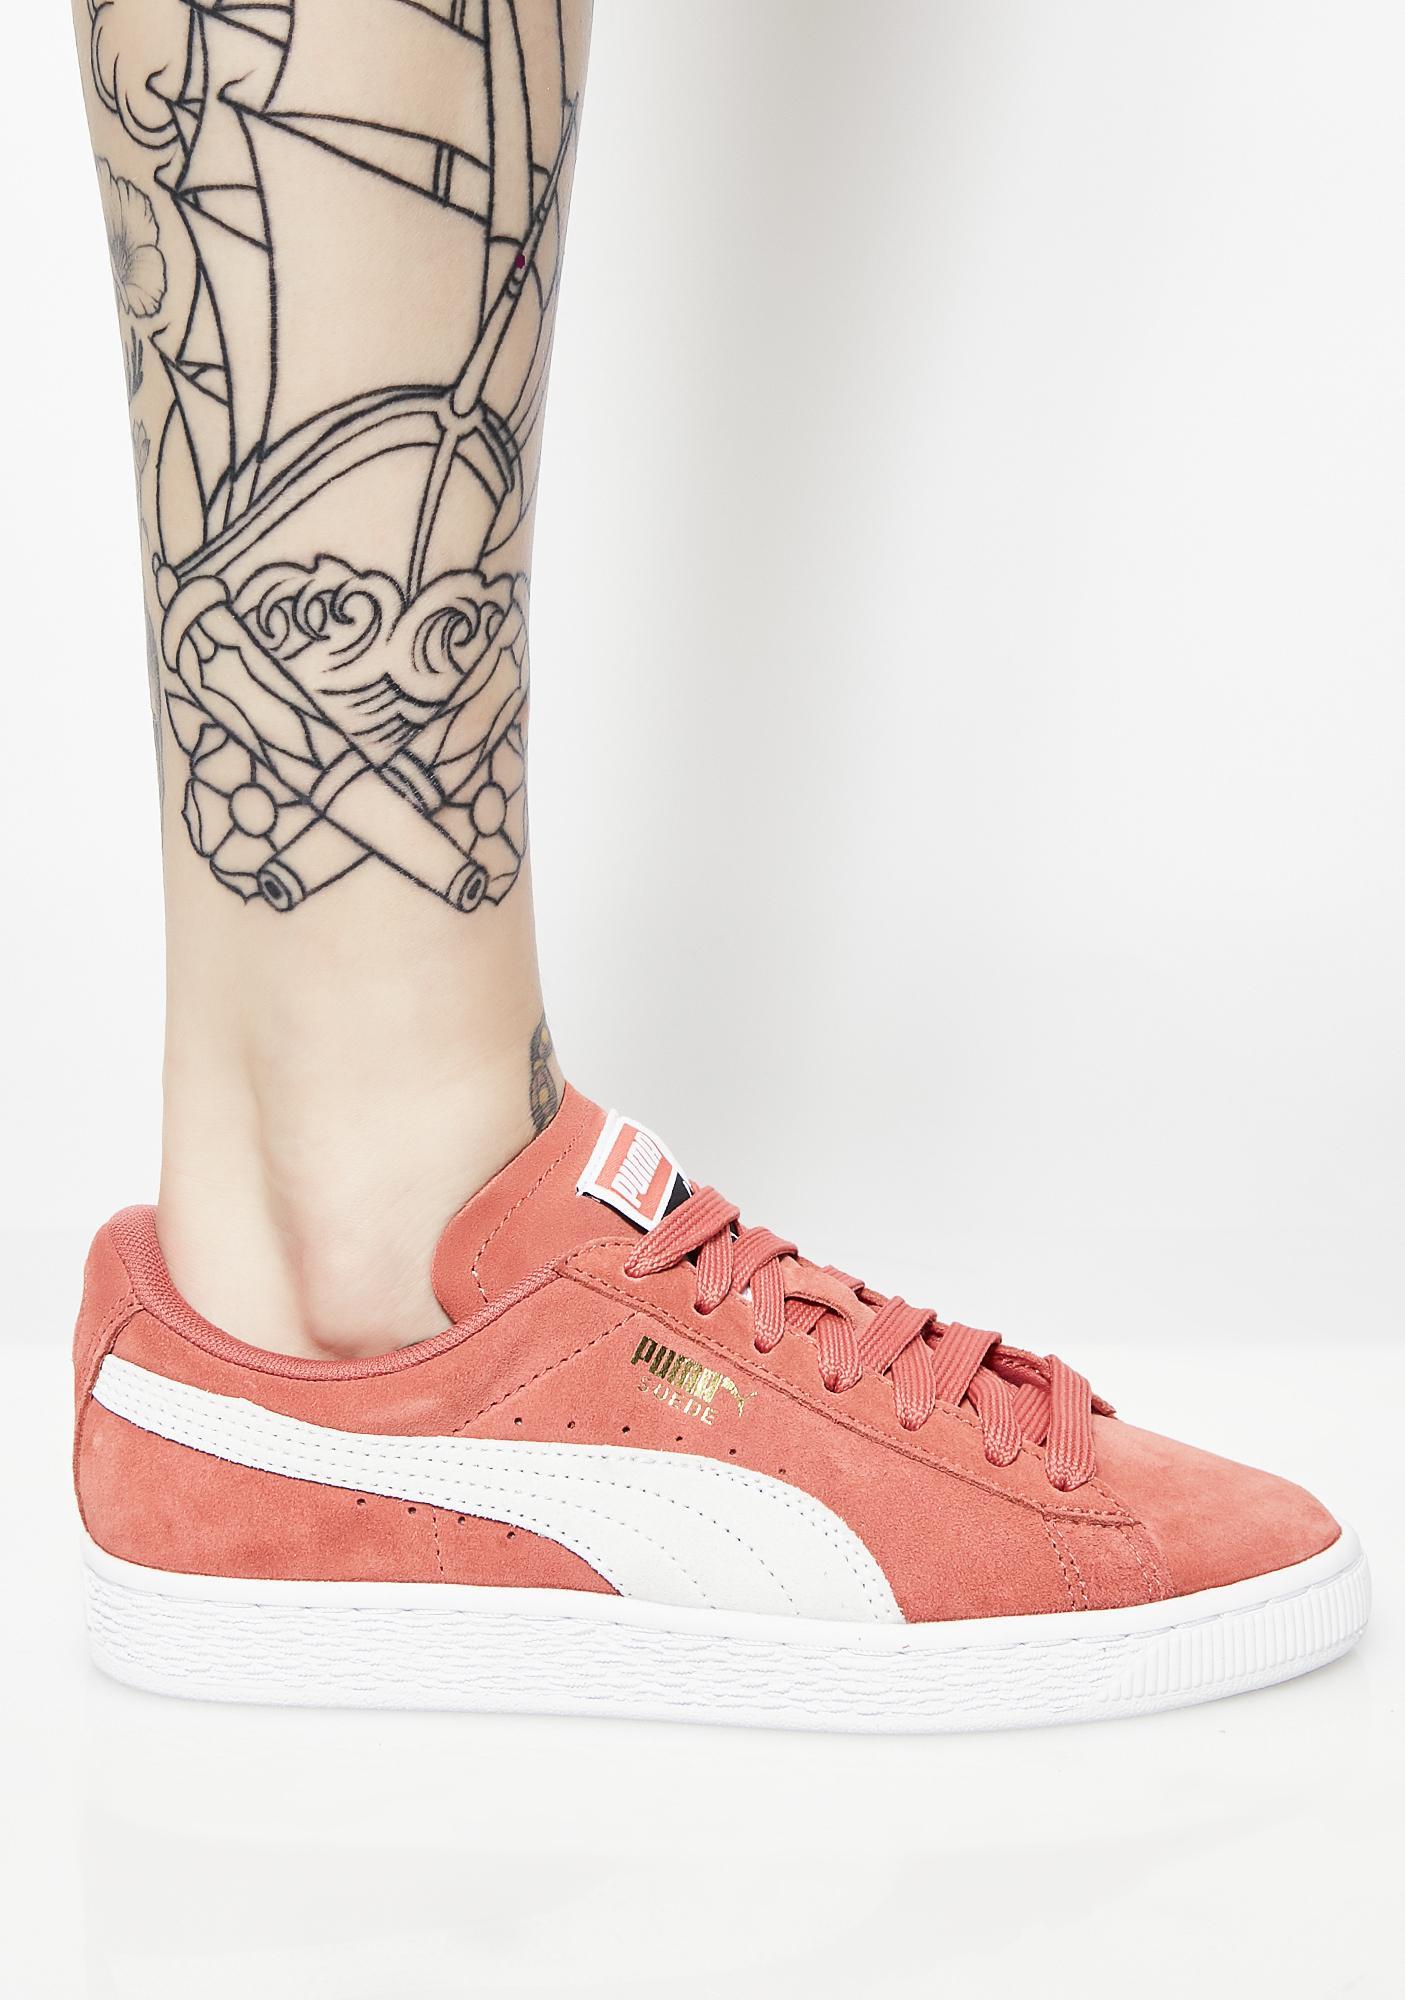 PUMA Coral Platform Kiss Lea Sneakers